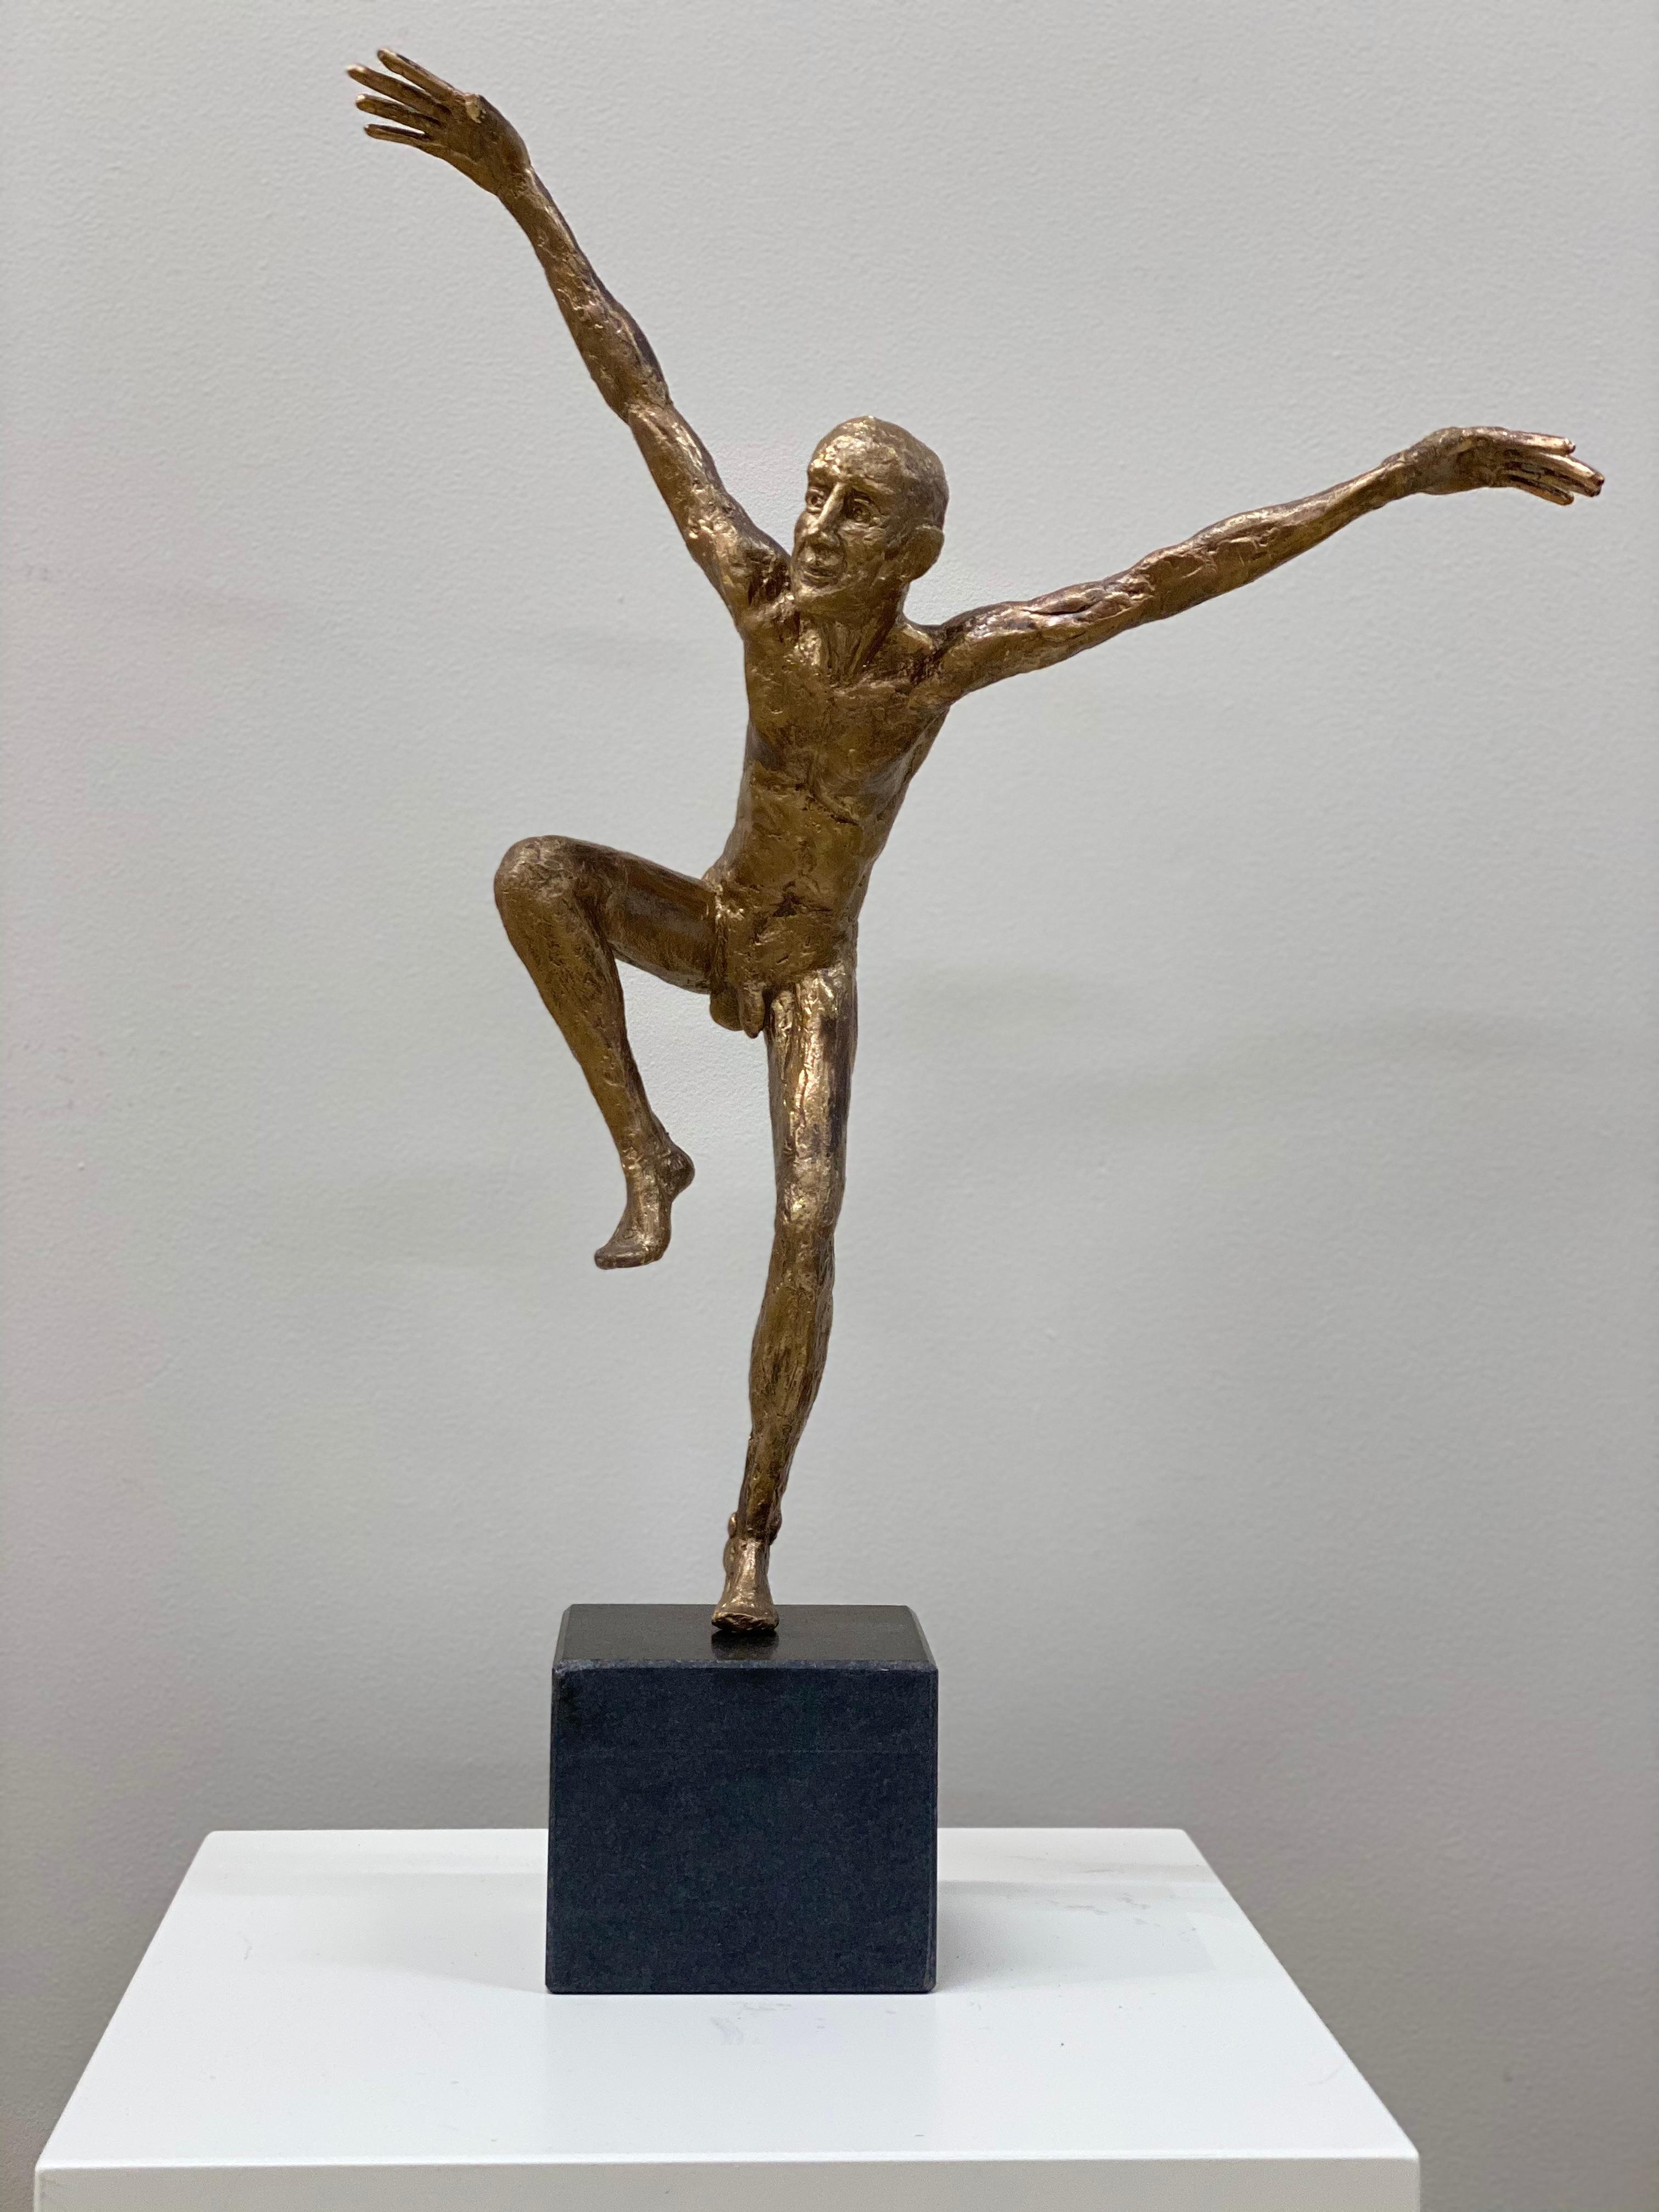 Dancer VI- 21st Century Bronze Sculpture of a Male Nude Dancing